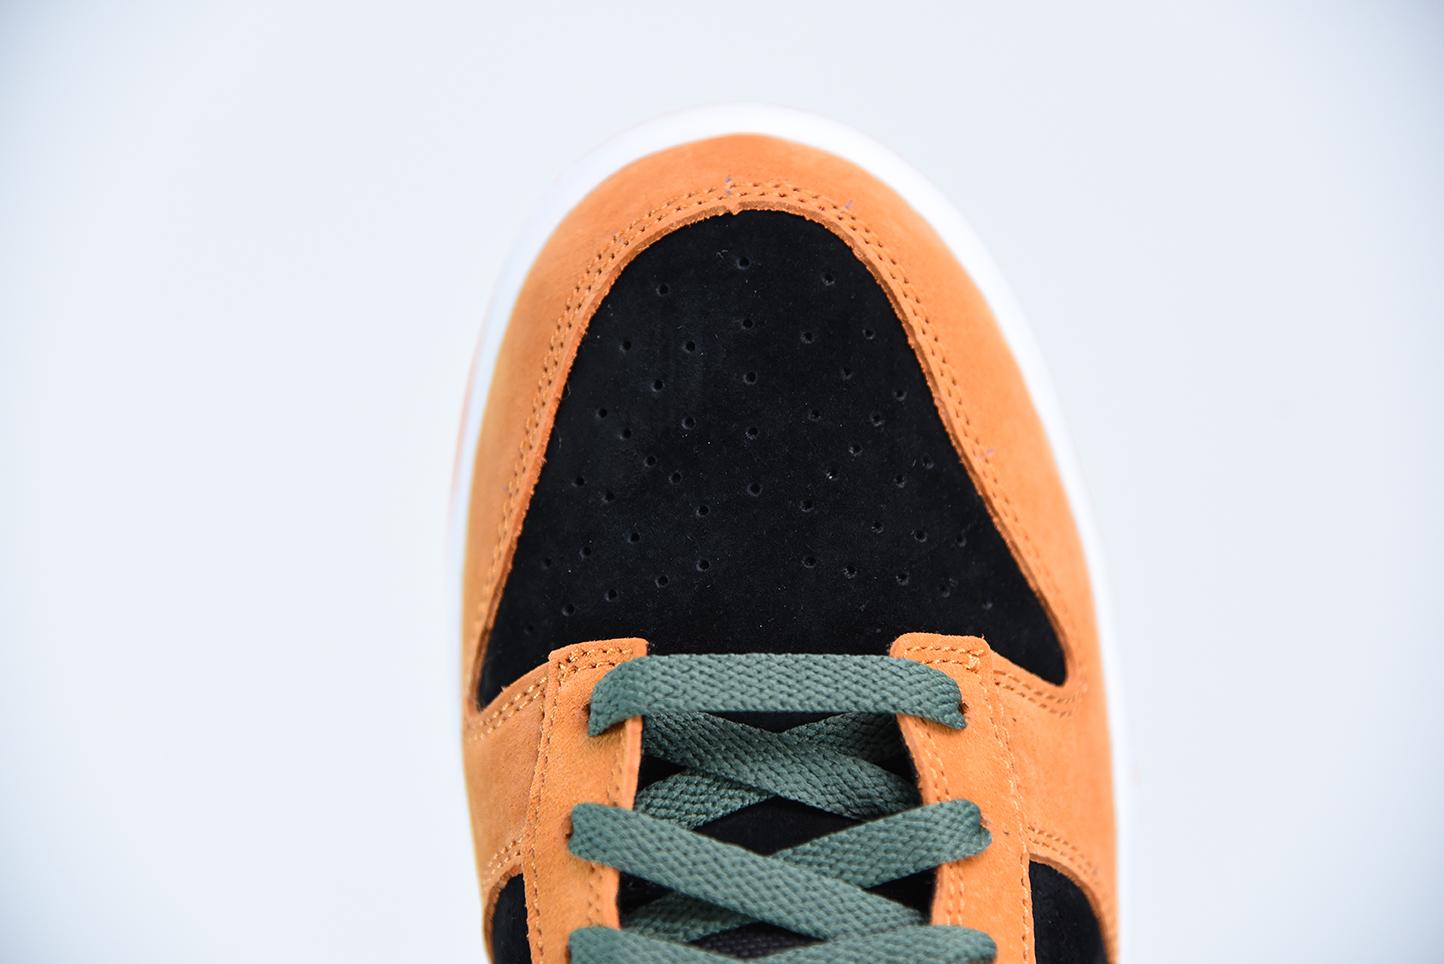 I08C4 Dunk SB Low Sp 黑橙 丑小鸭 DA1469-001尺码36-46